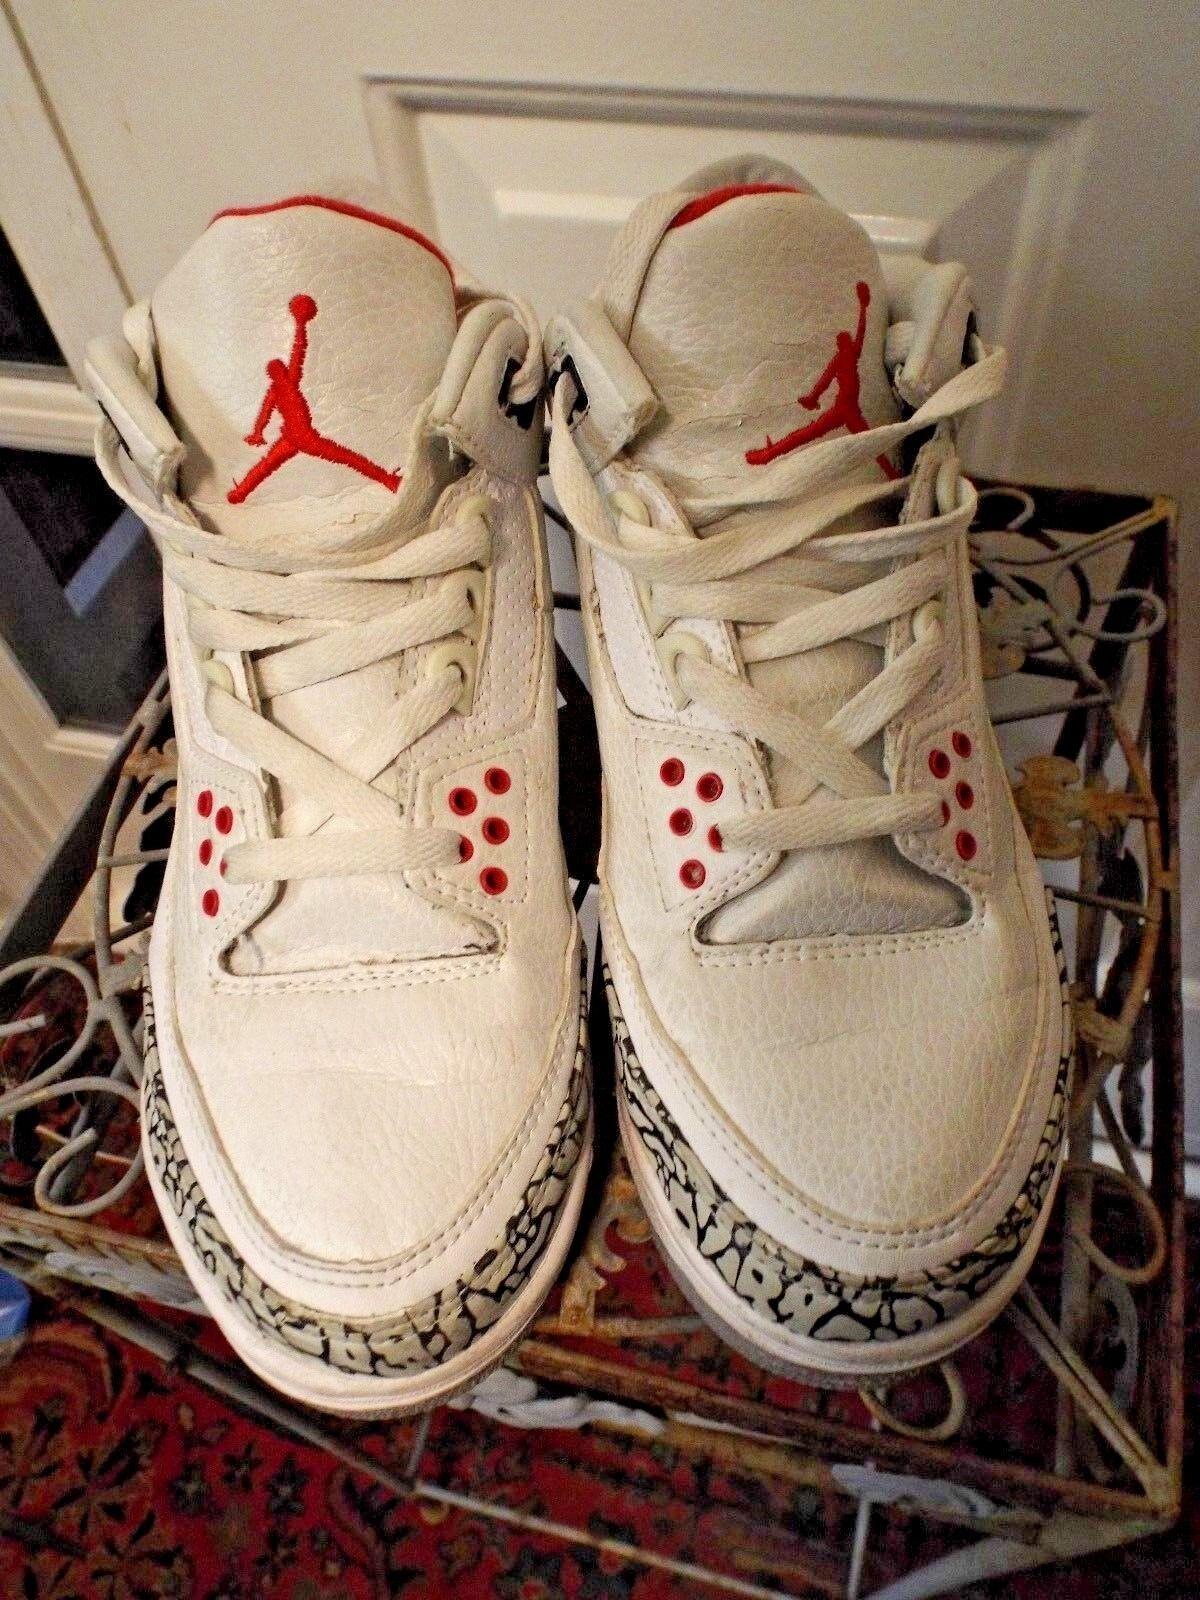 EUC  2005 - Nike Air Jordan 3 Retro - Sz 7 -  White Fire Red Silver Nero